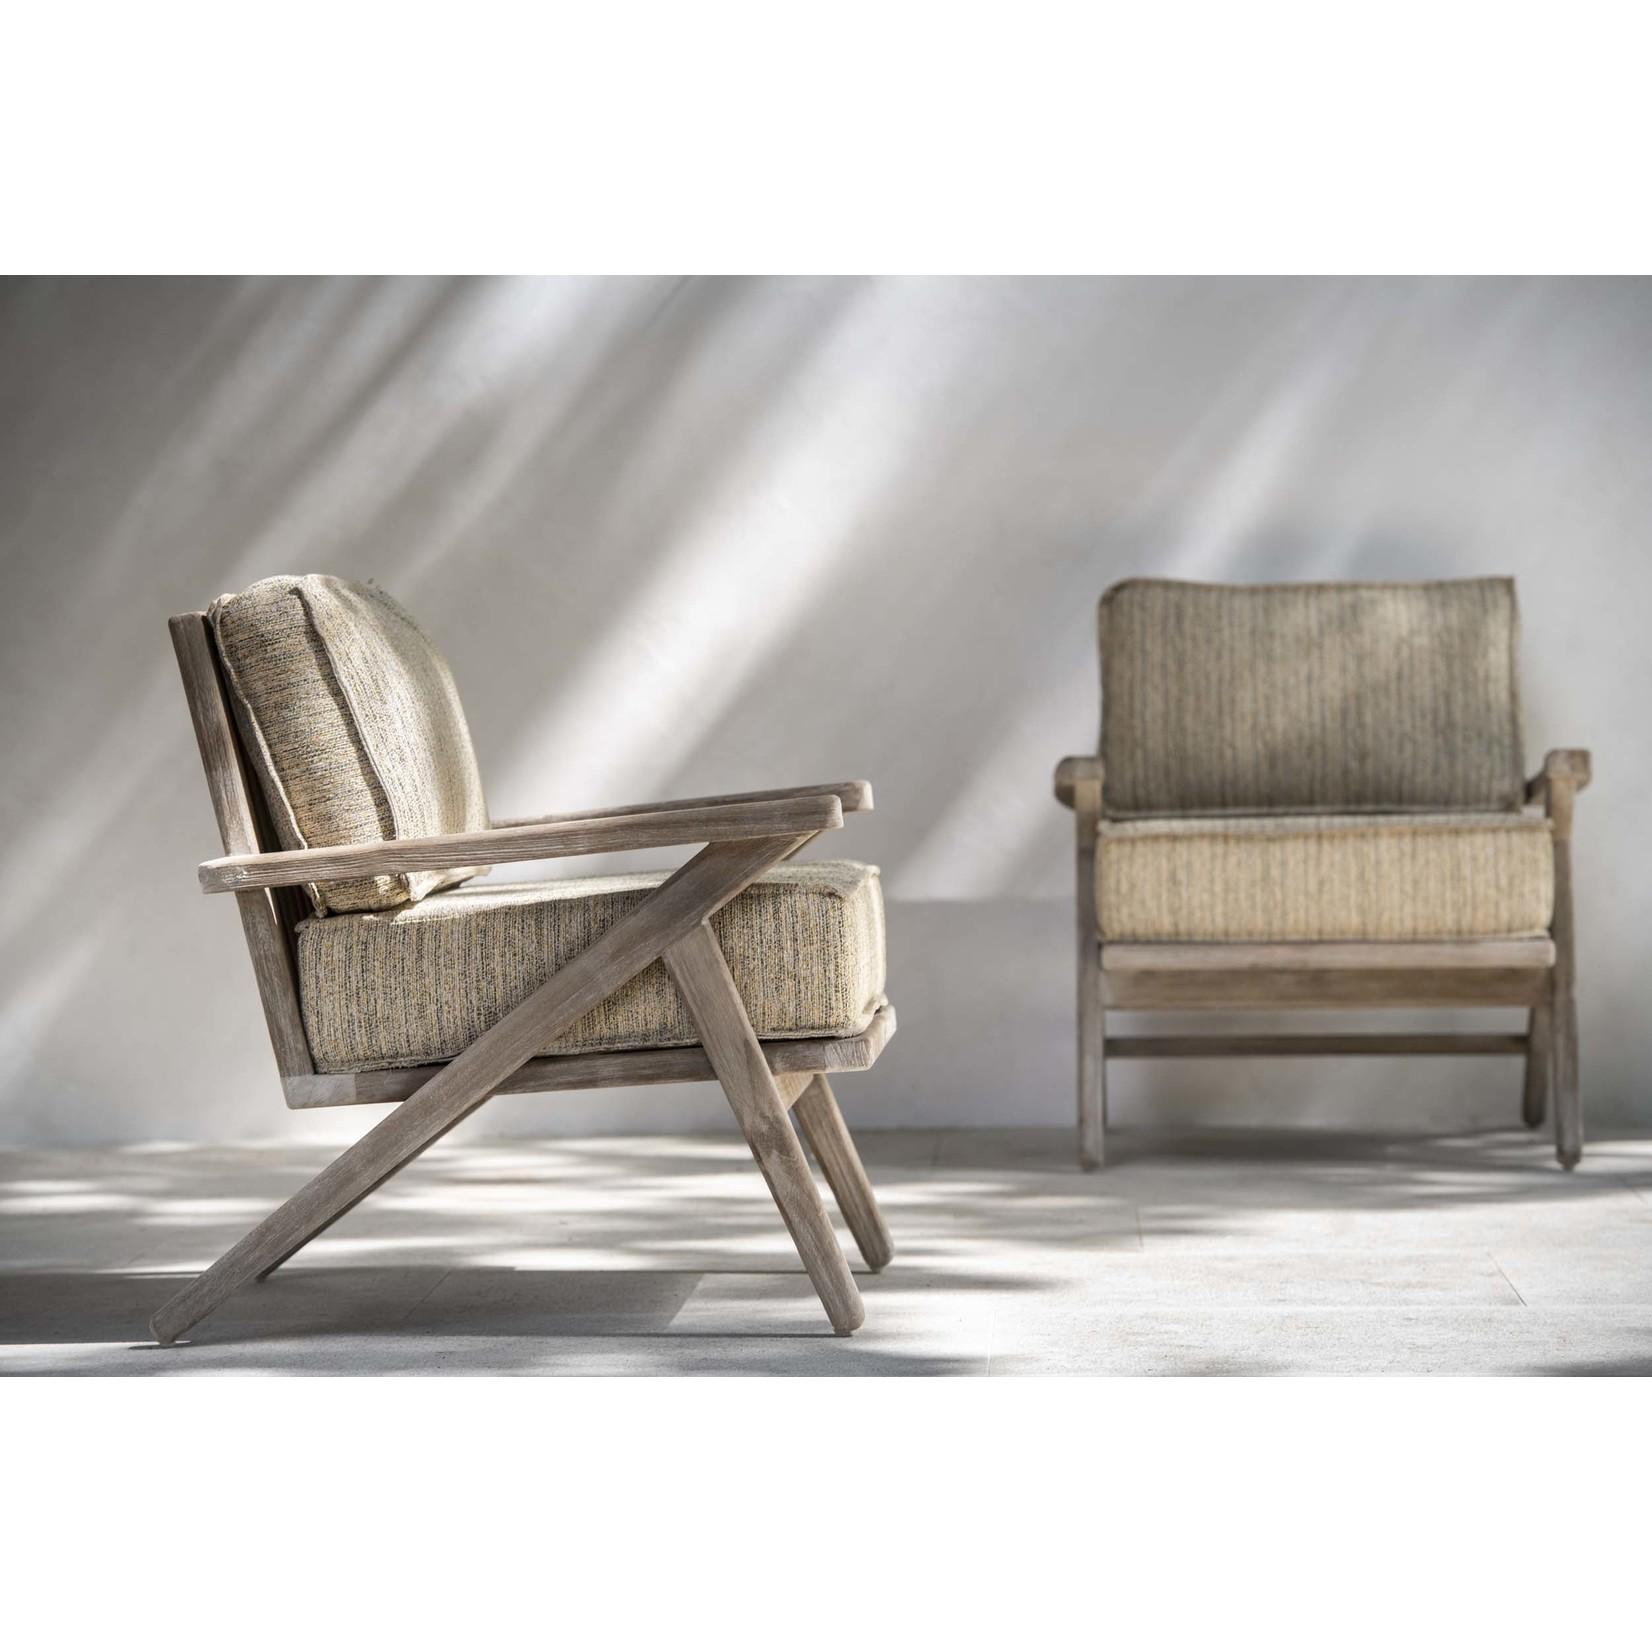 Gommaire 1-Seater Alabama   Teak Natural Gray + Cushion